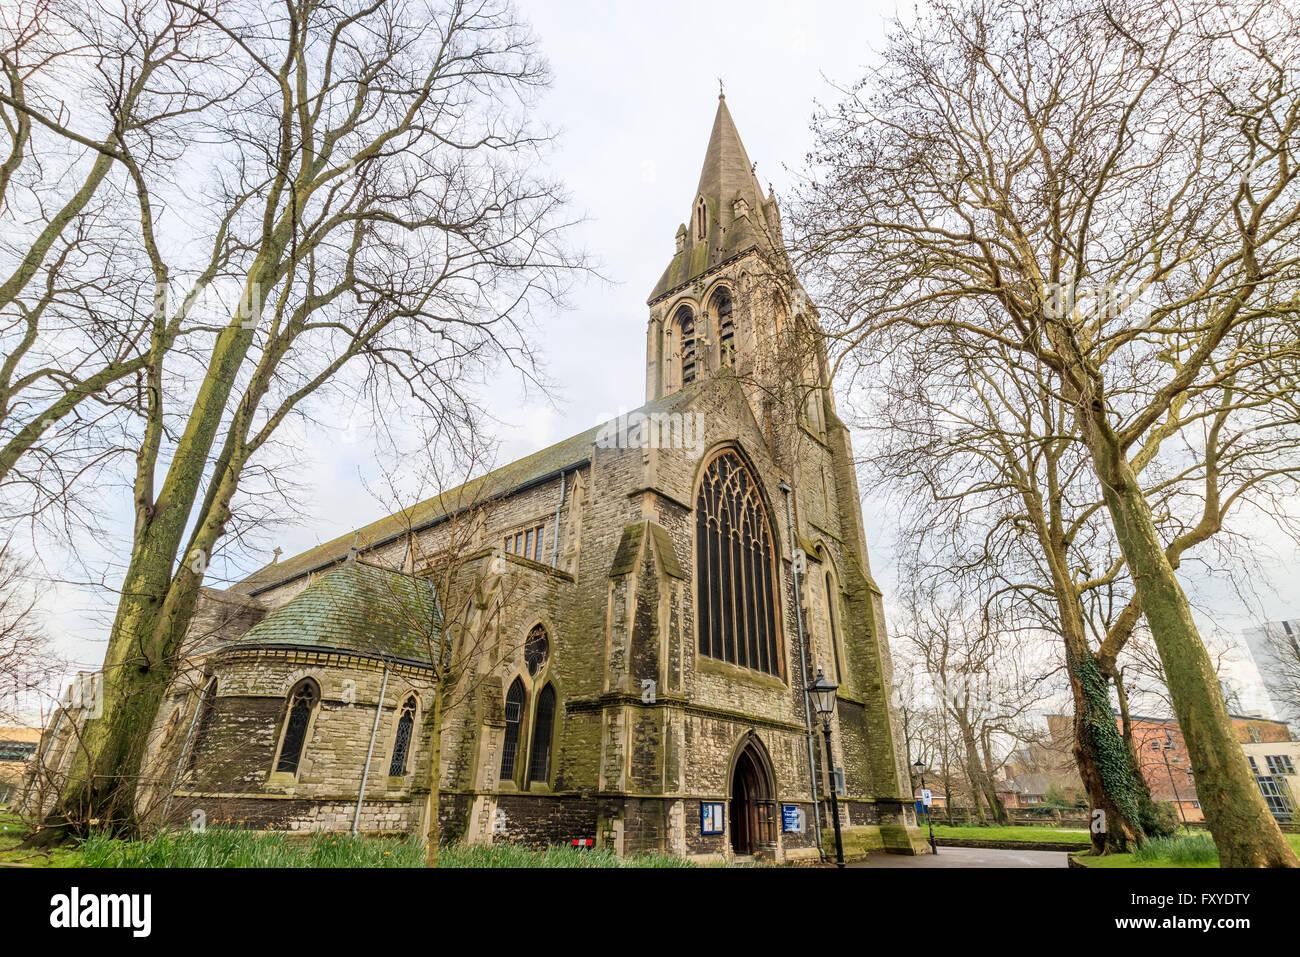 Beautiful and historical Saint Mary's Church at Southampton - Stock Image